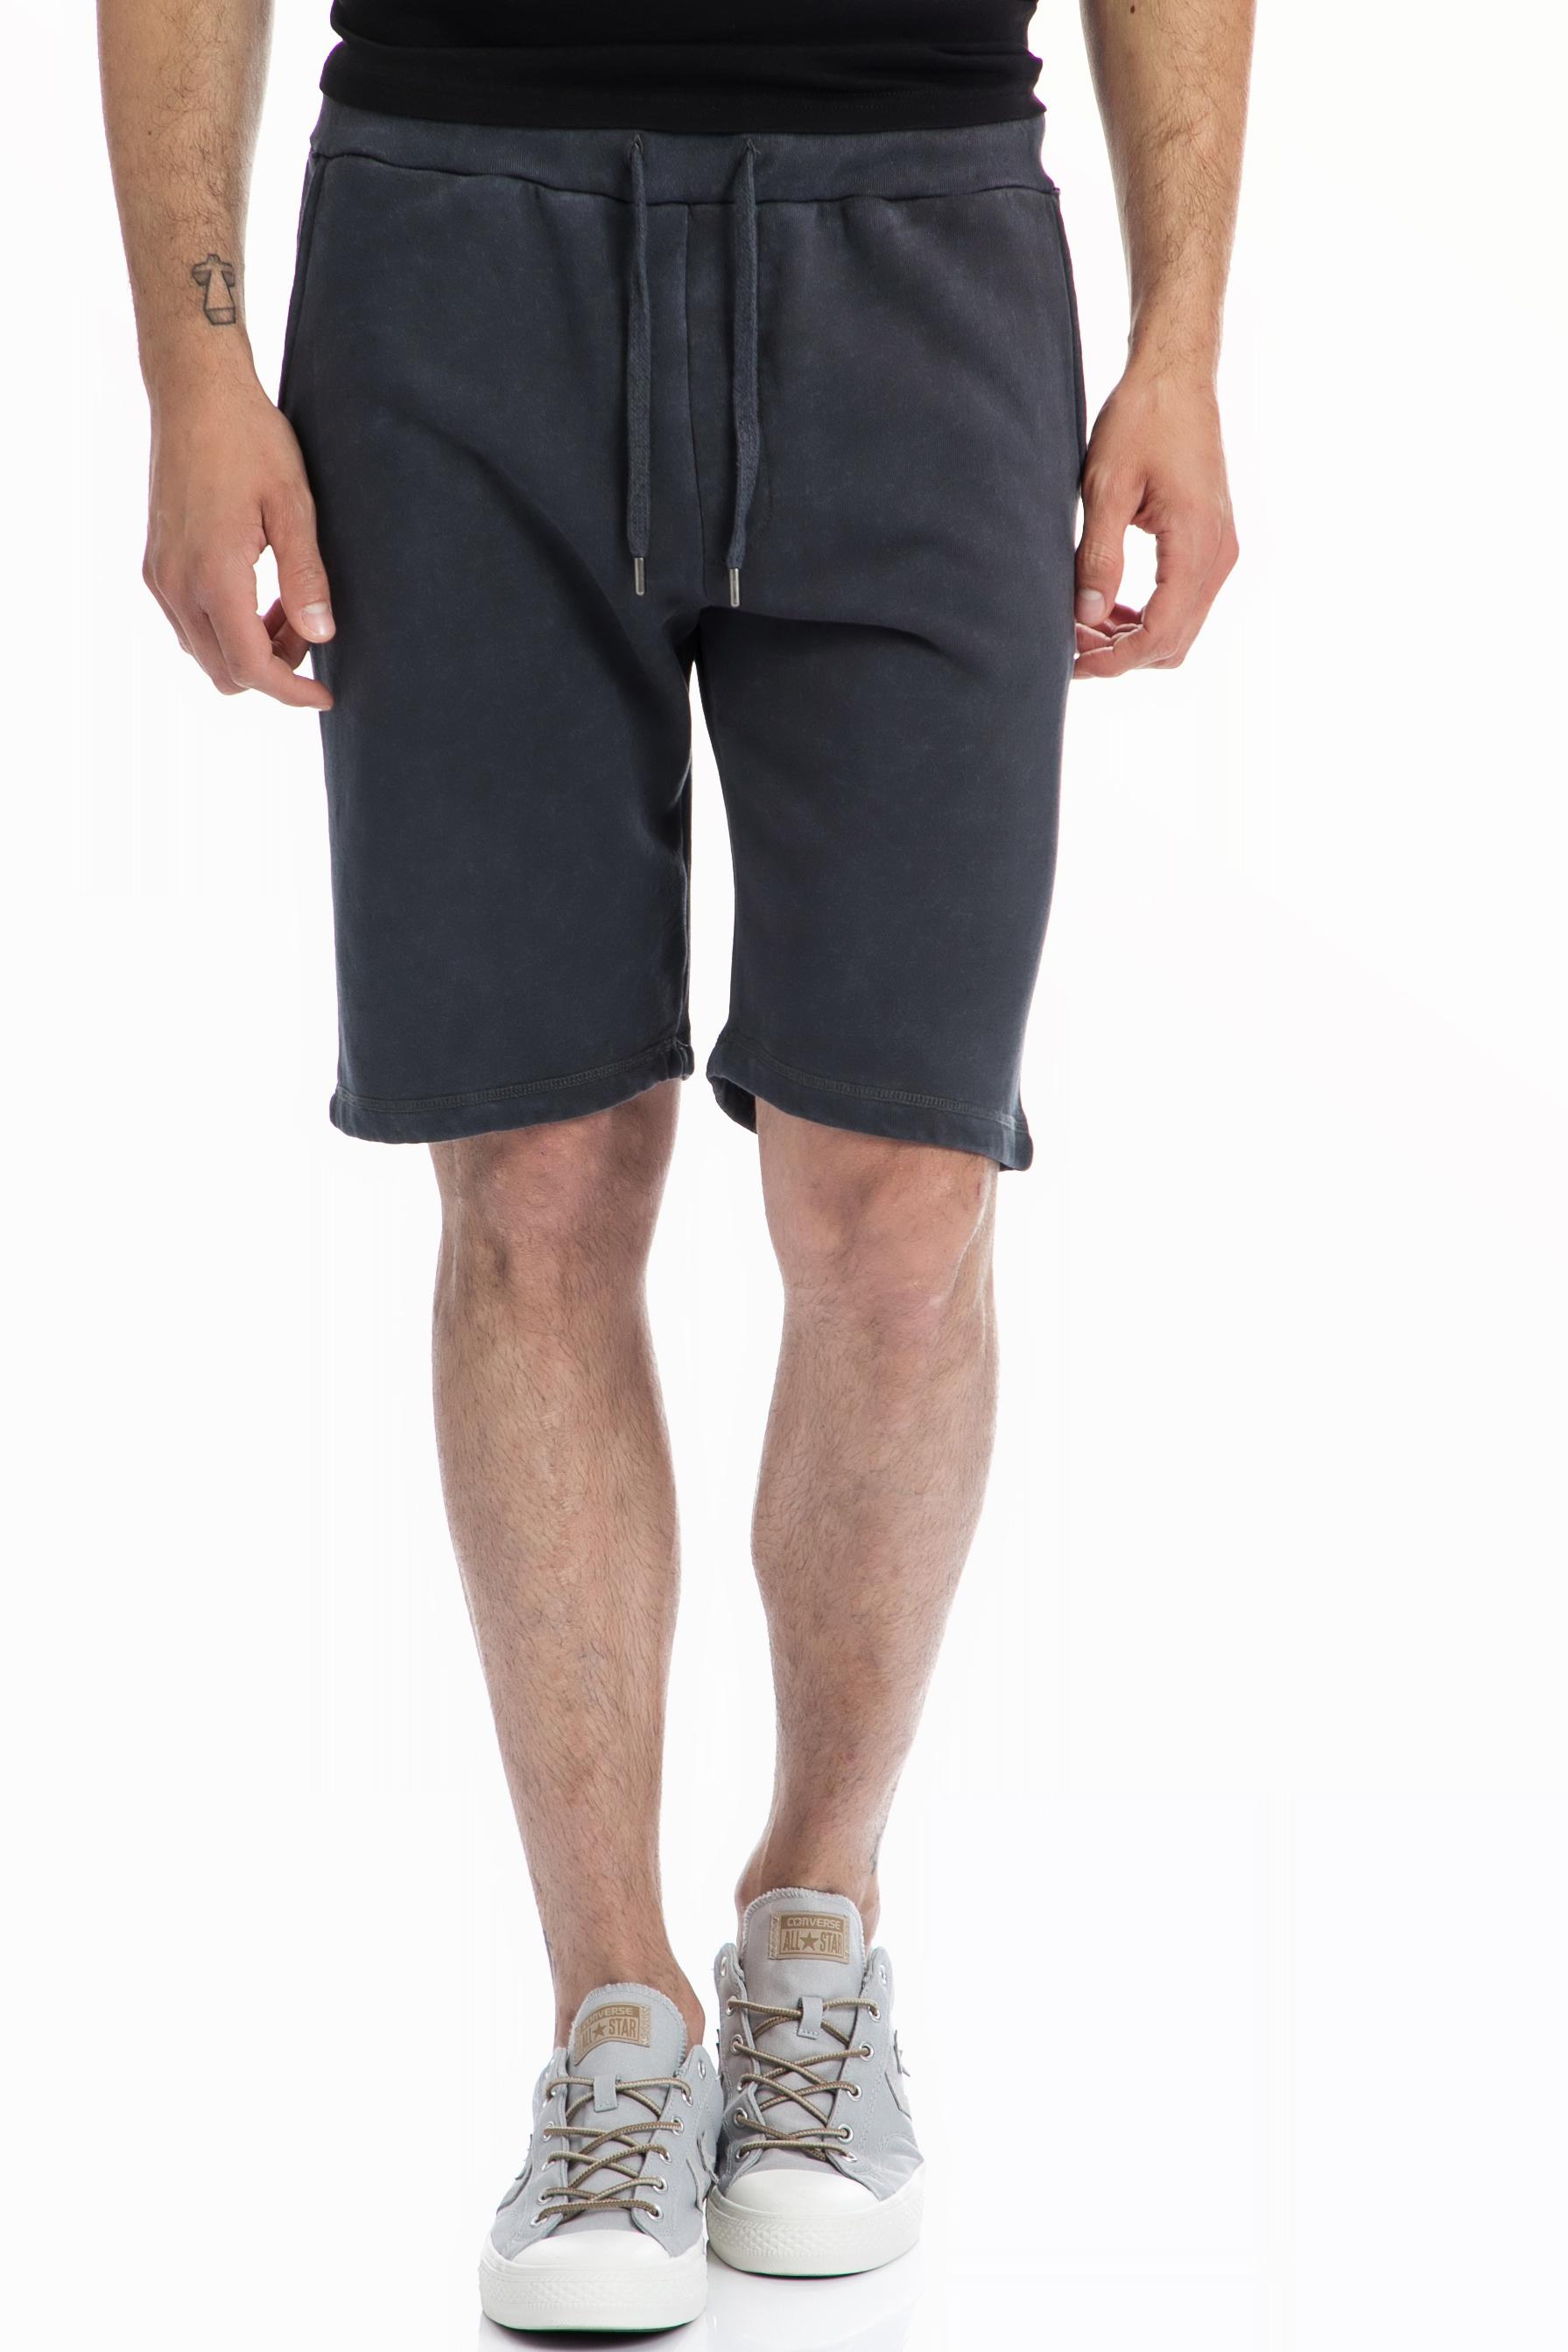 40-WEFT - Ανδρική βερμούδα 40-WEFT μαύρη-γκρι ανδρικά ρούχα σορτς βερμούδες αθλητικά